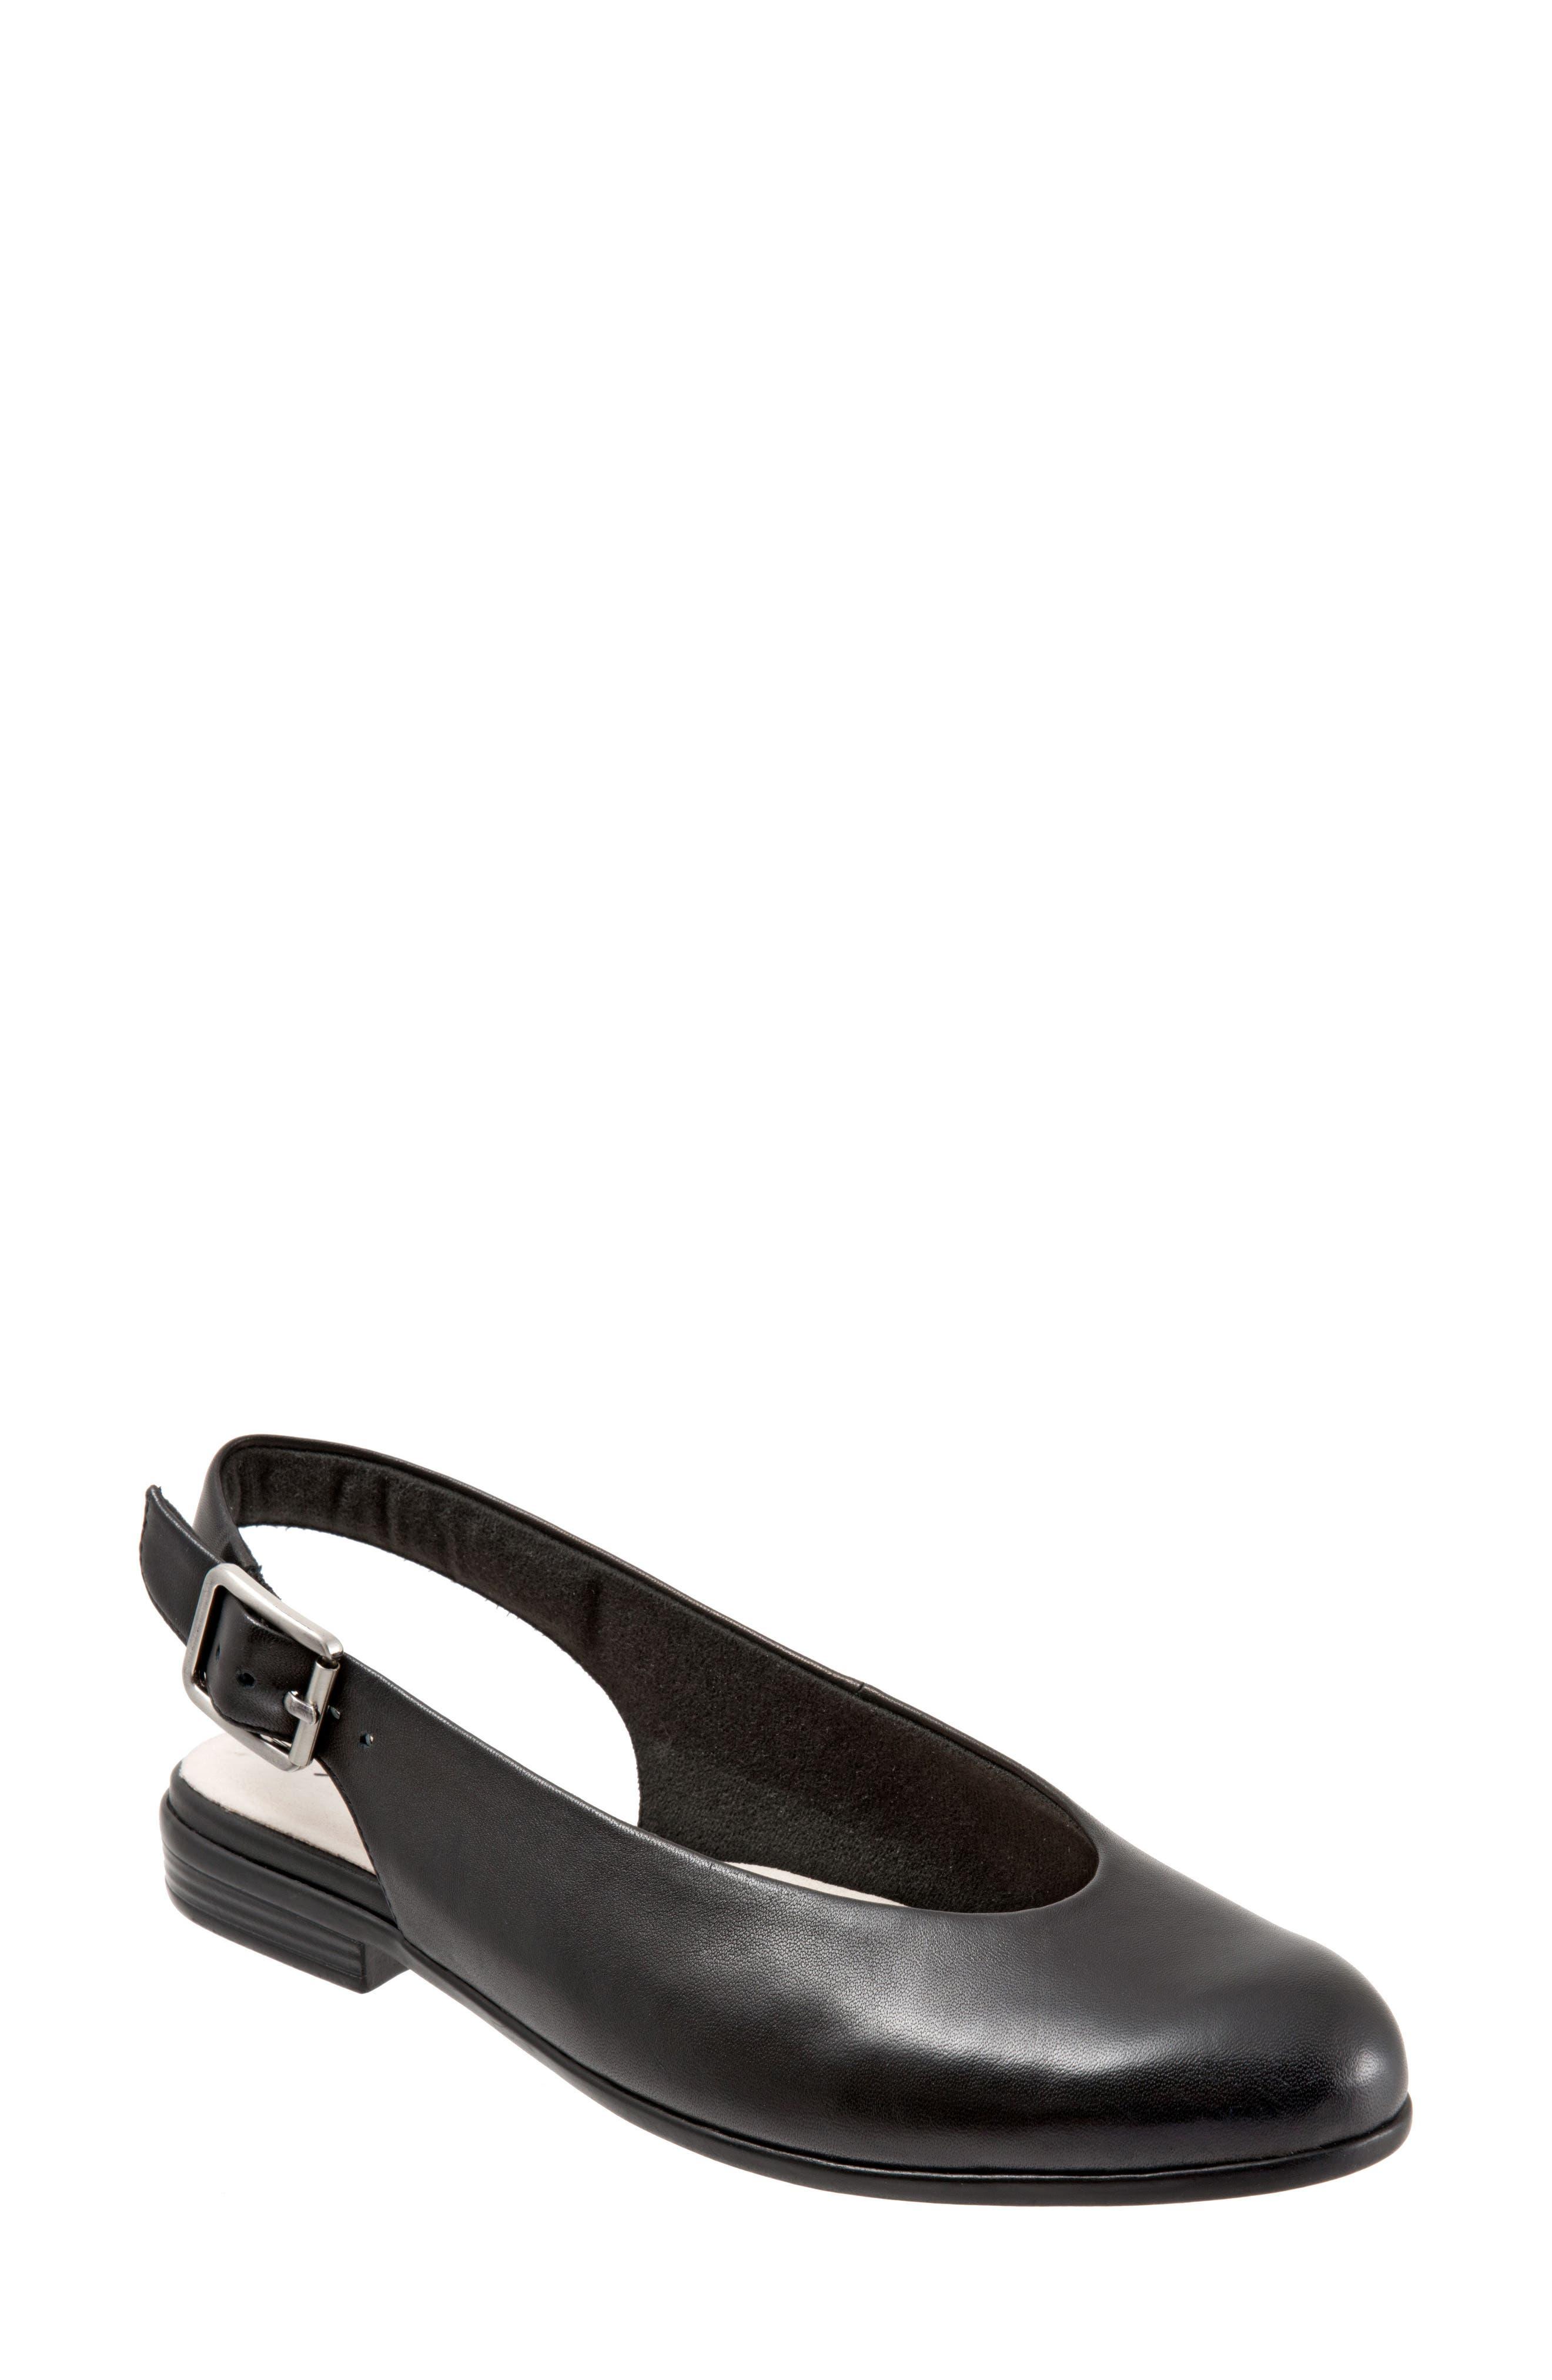 Alice Flat,                         Main,                         color, Black Leather